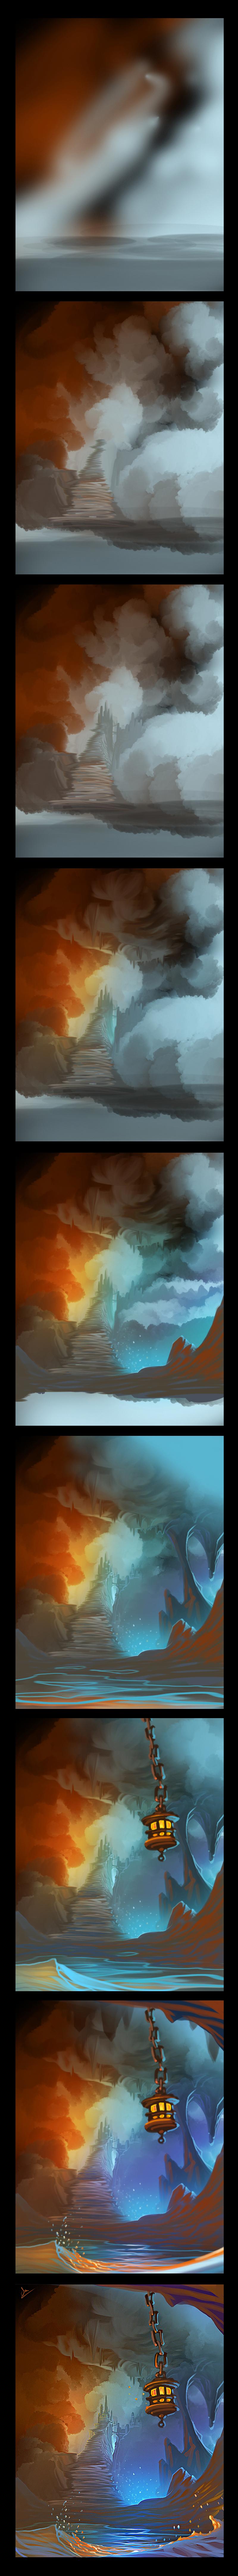 Underworld: Step by step